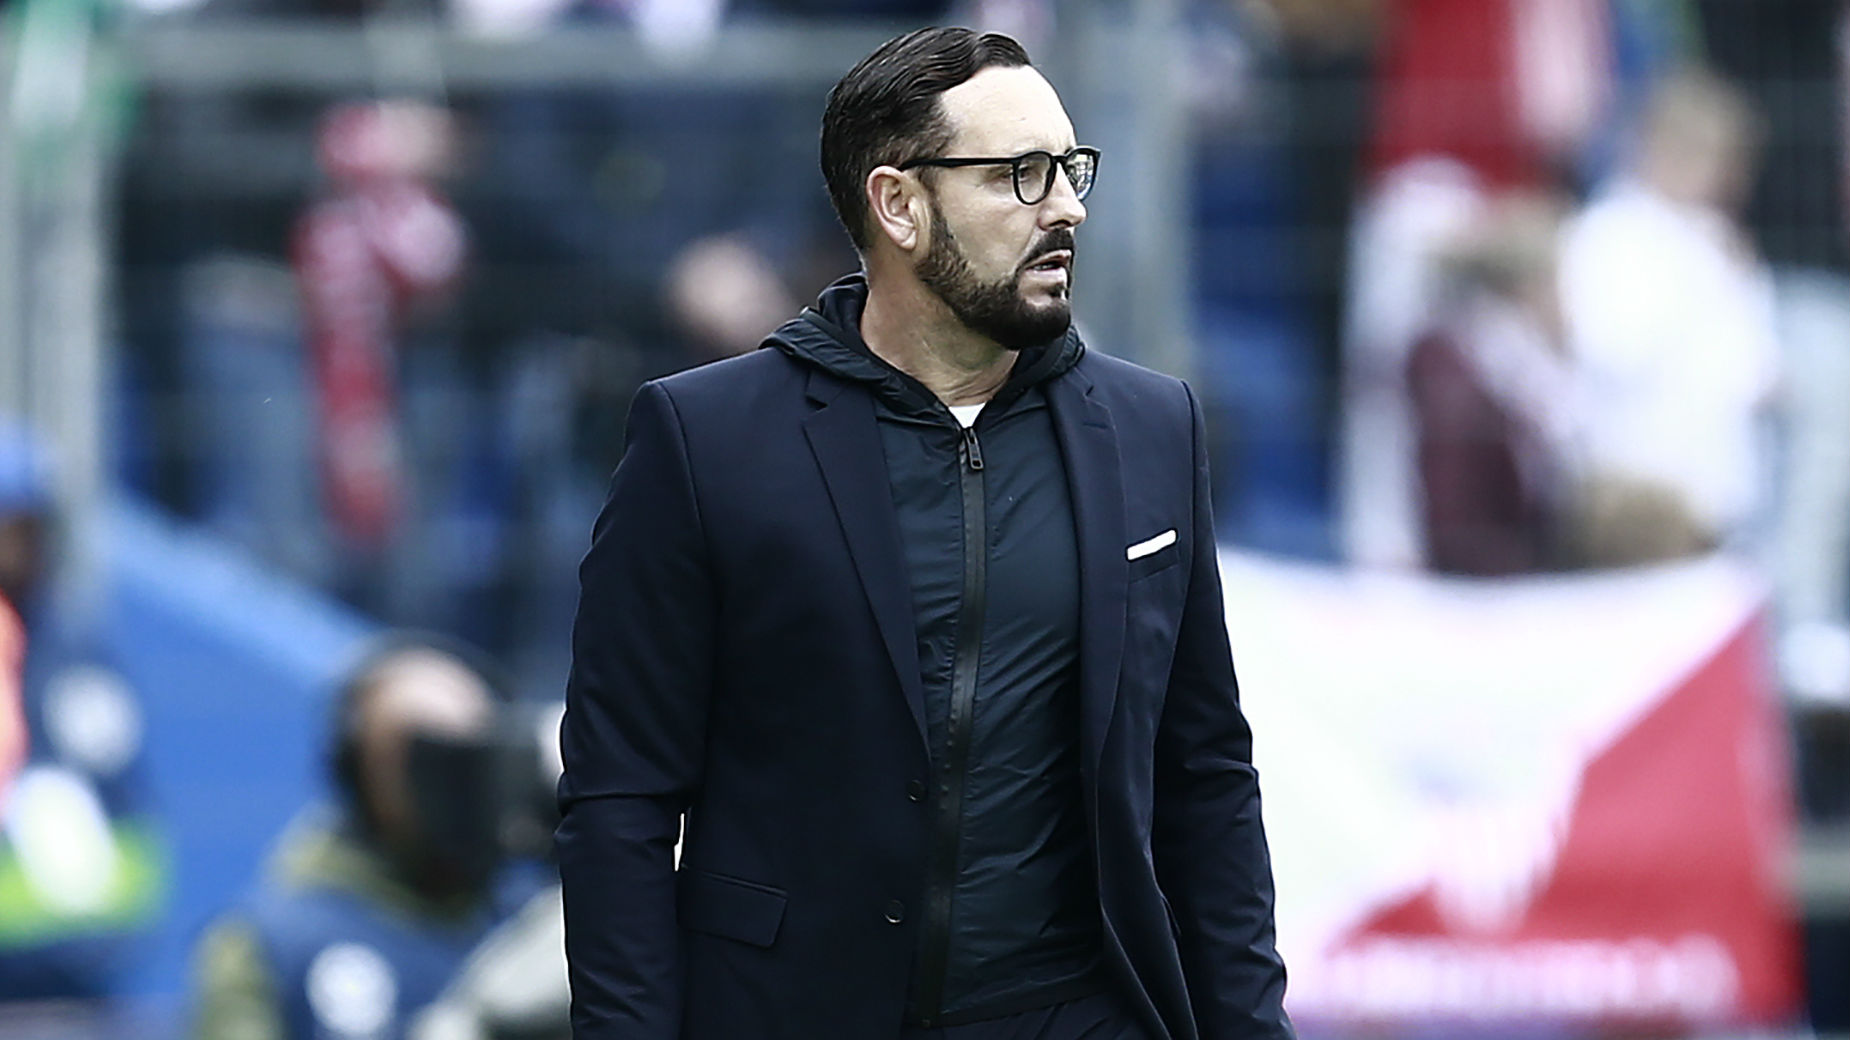 Getafe coach Bordalas pens new contract